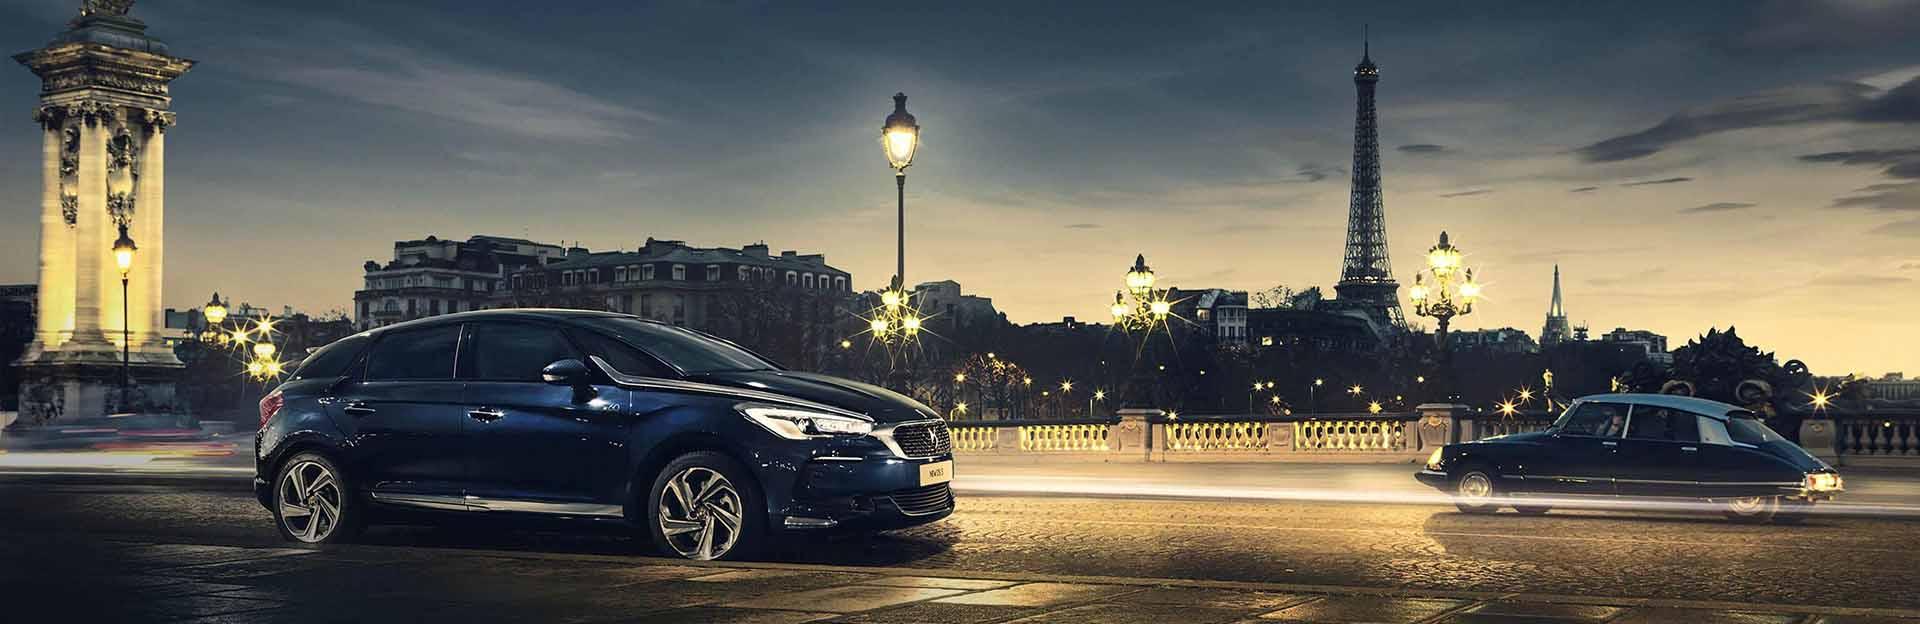 prodaja-novih-vozila-citroen-rijeka-ds5